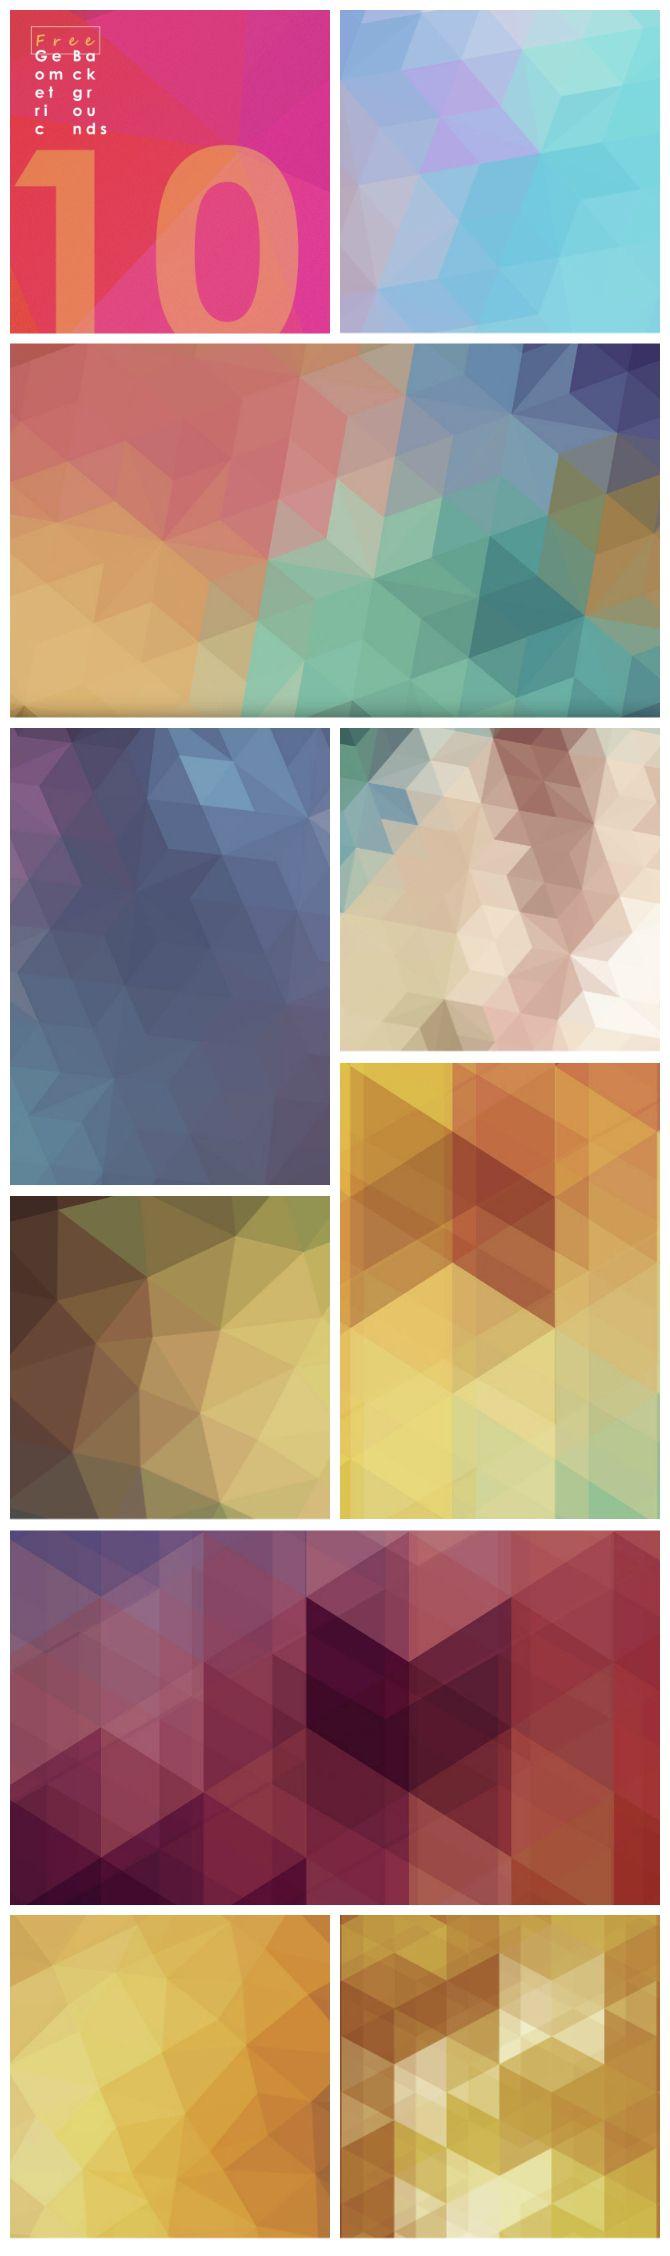 Free #Geometric #Backgrounds | Designed by http://83oranges.com/free-geometric-backgrounds/?utm_content=bufferd85b0&utm_medium=social&utm_source=pinterest.com&utm_campaign=buffer